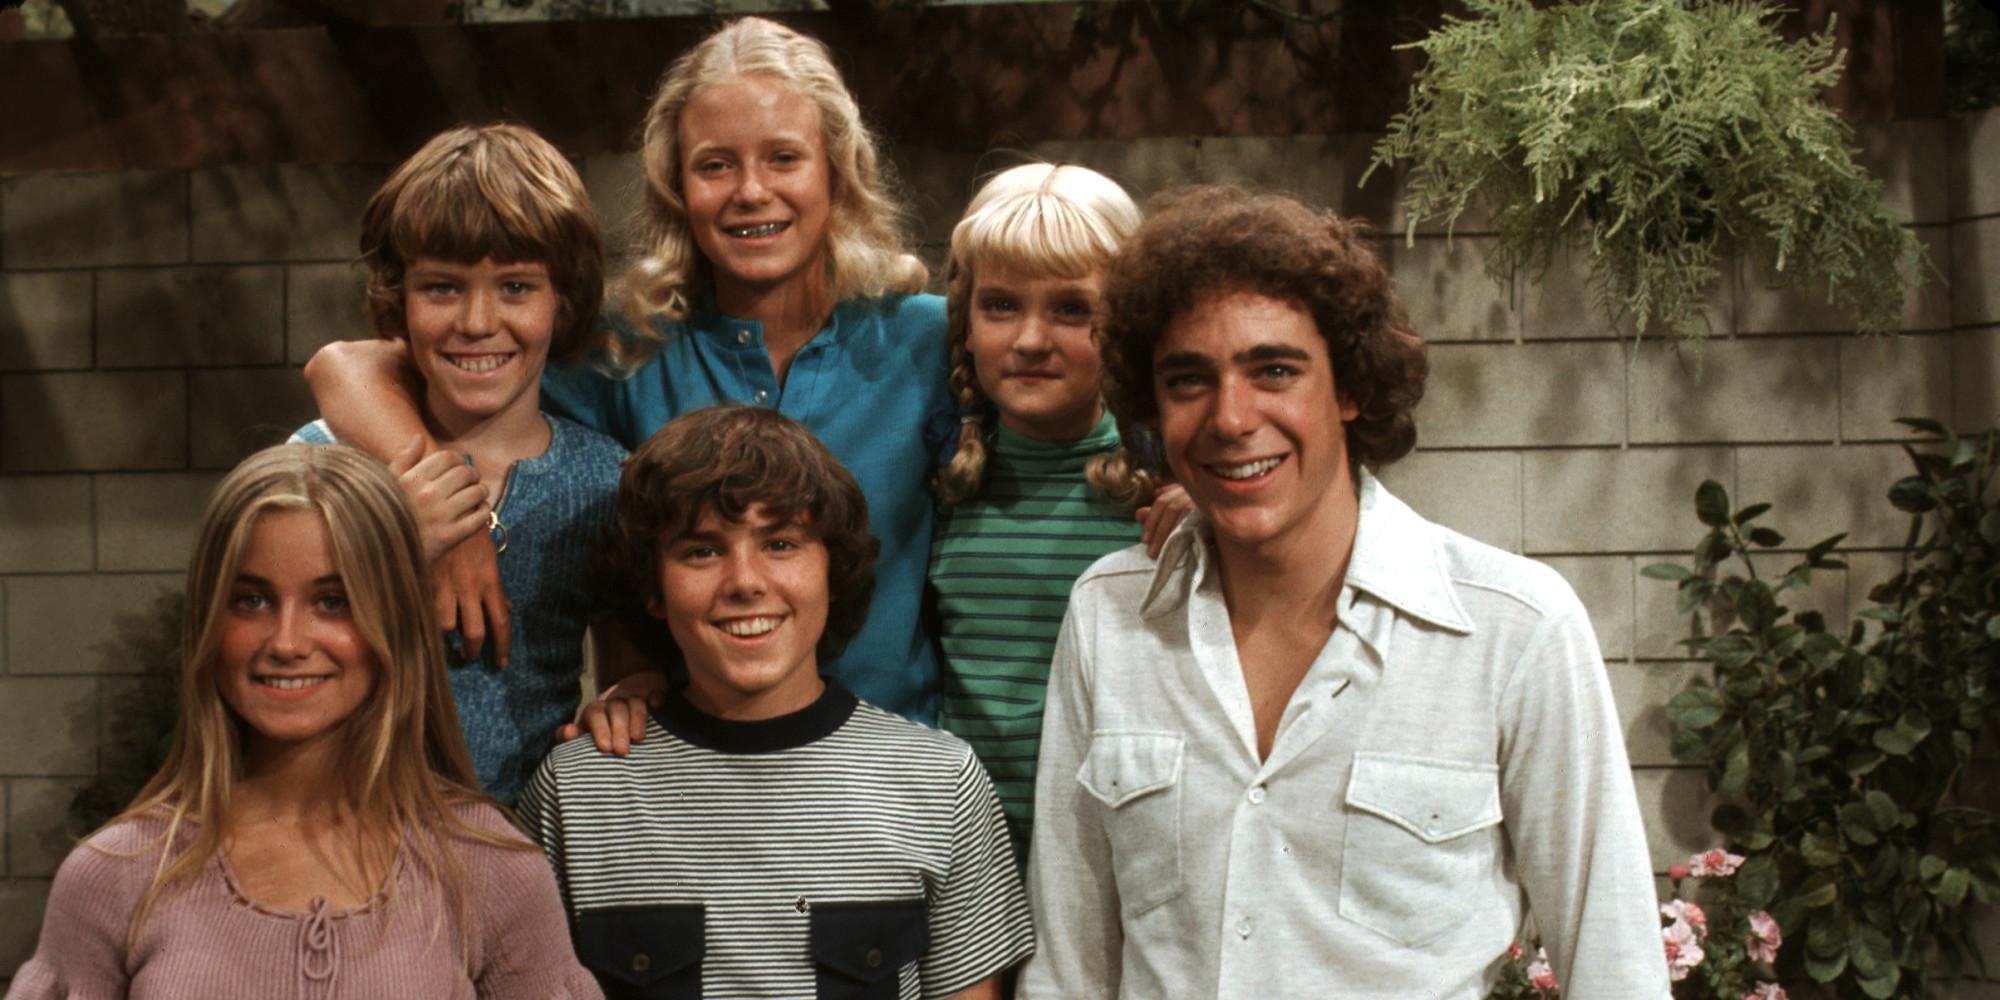 Buffy davis house of the rising moon 1986 - 2 part 3